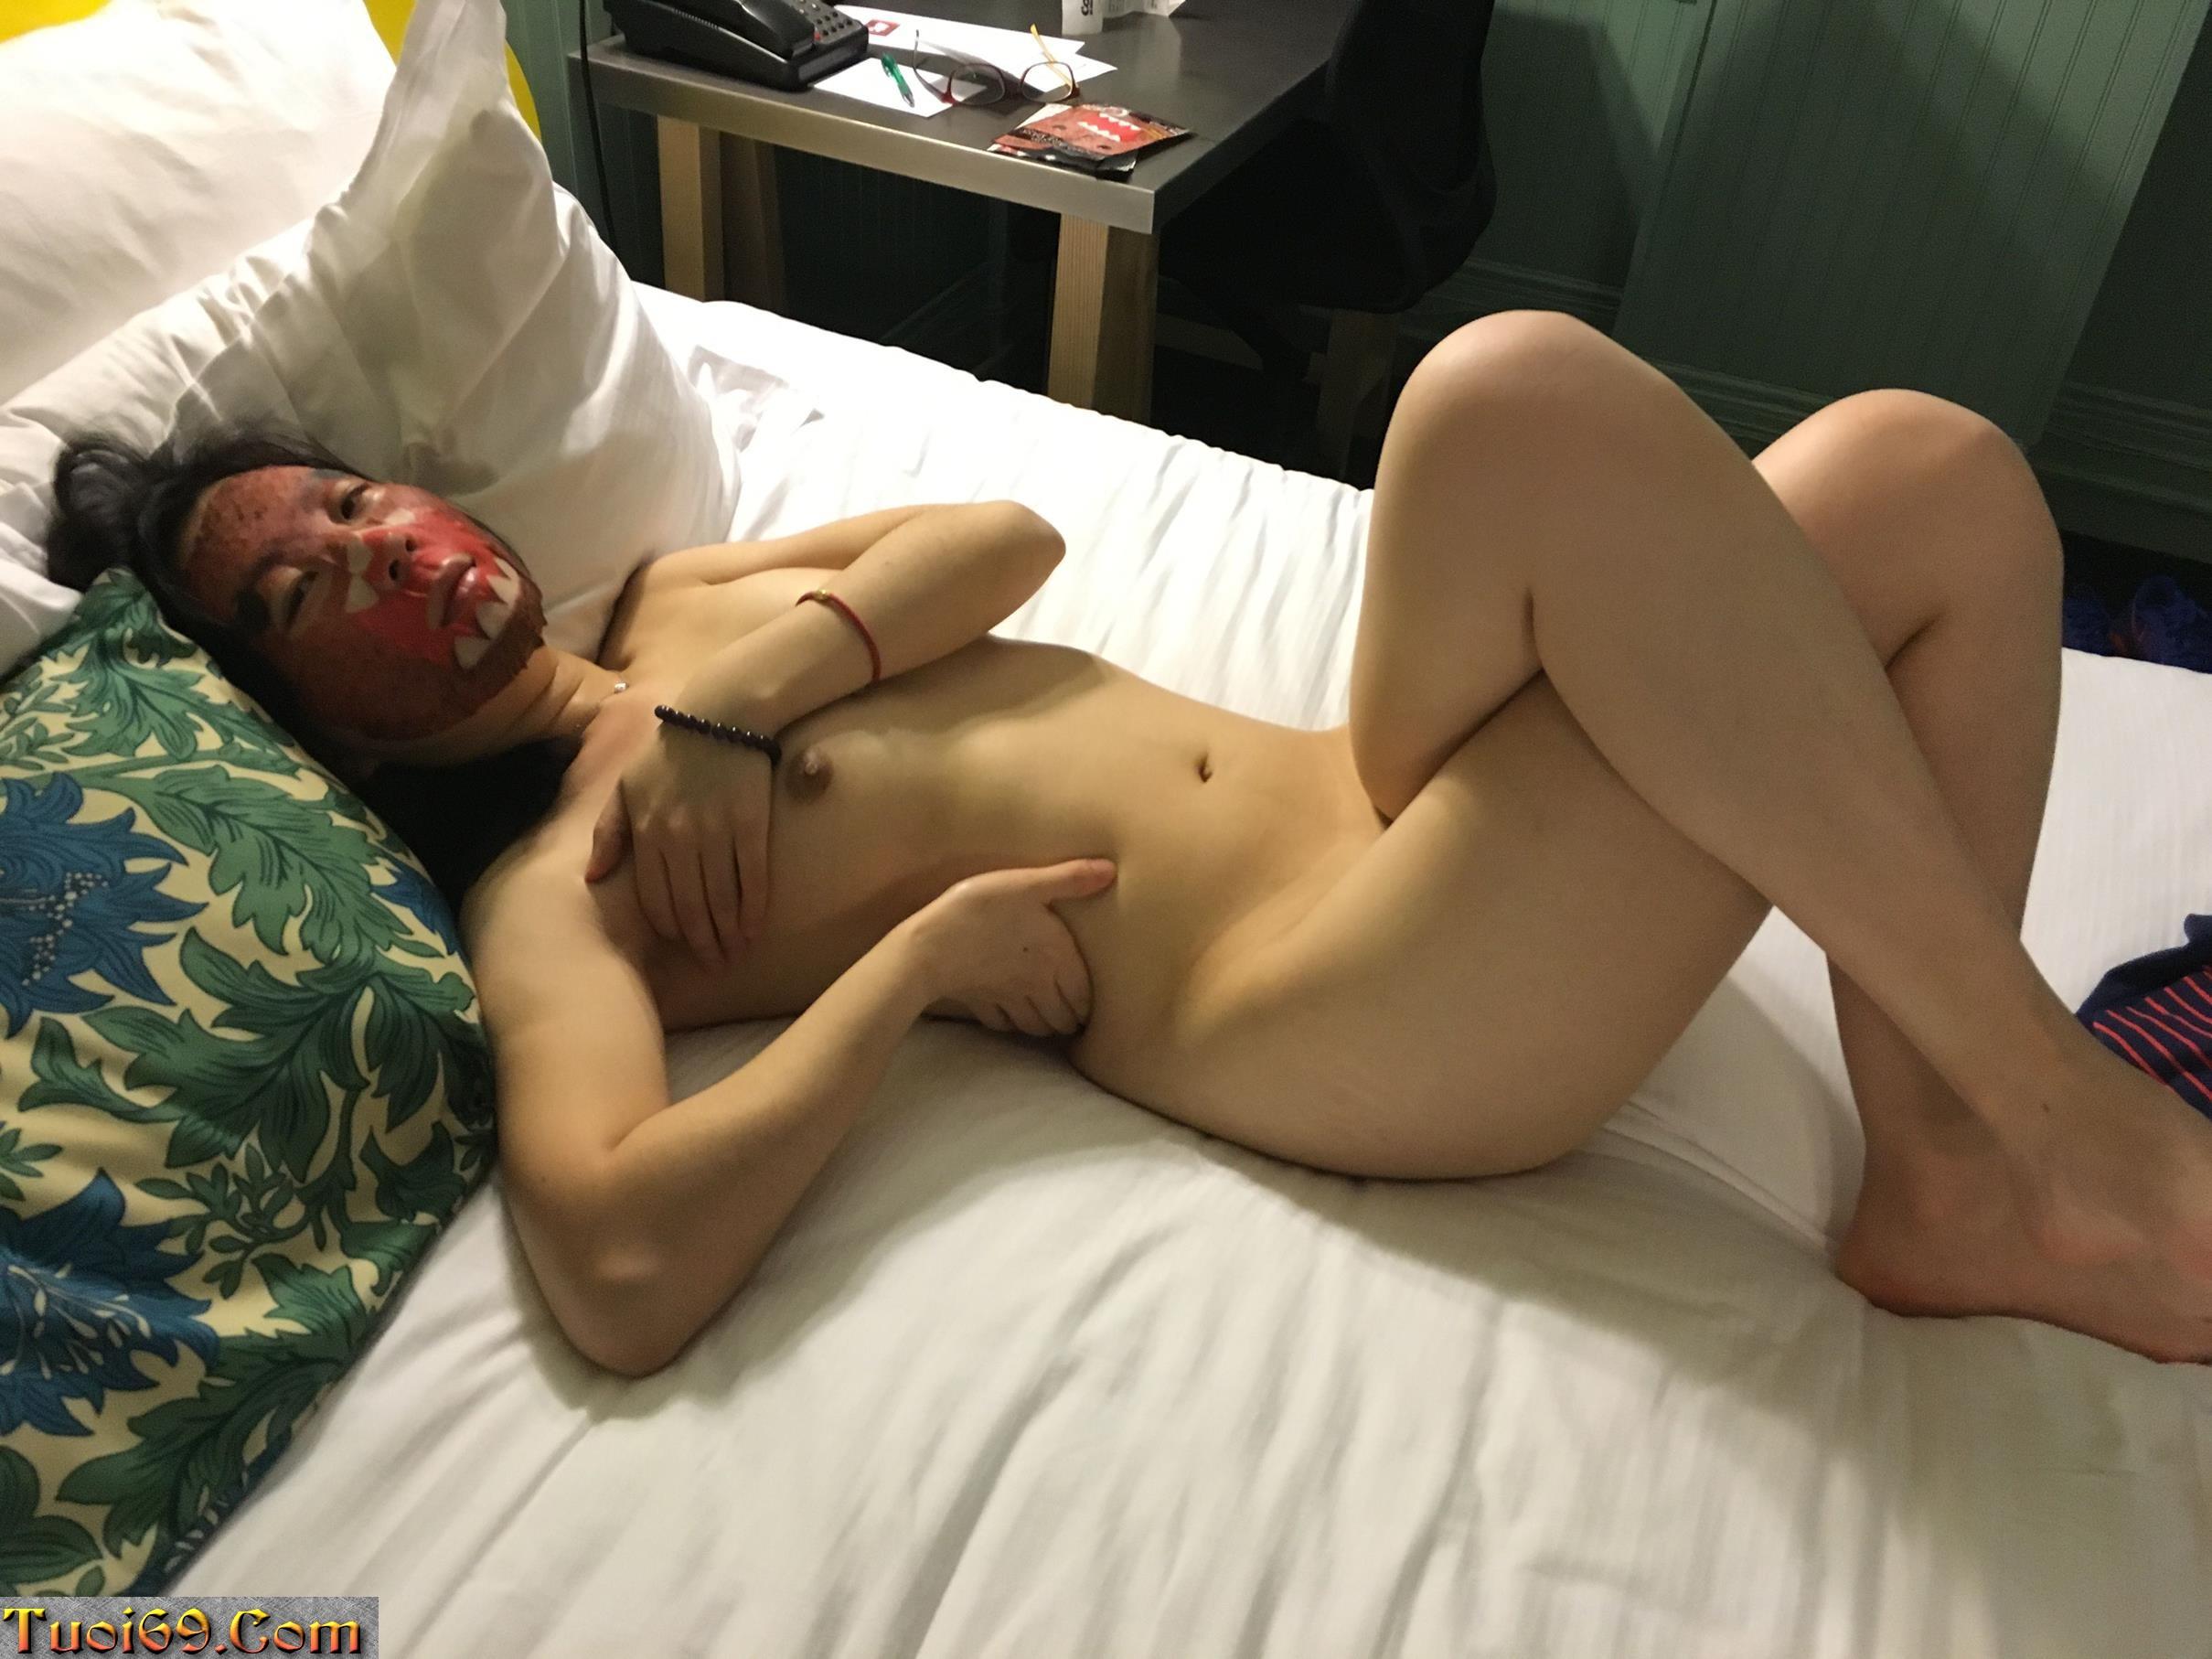 Cute-Korean-Carmen-nice-boobs-wet-pussy-masturbate-and-sex-photos-leaked-40-Copy